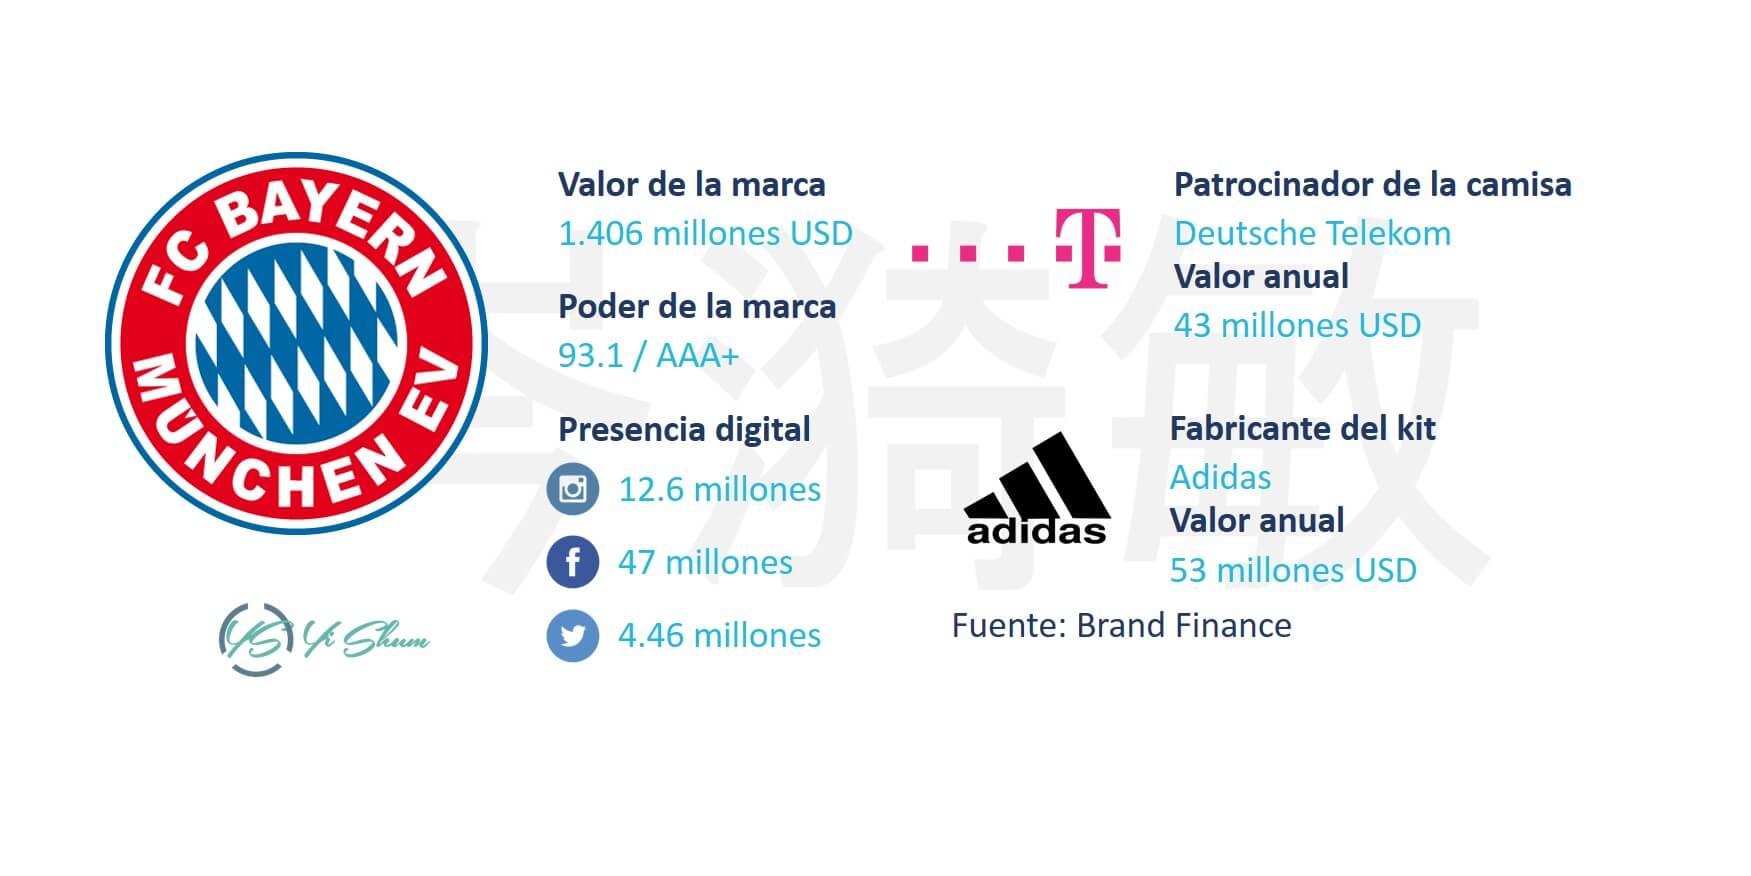 FC Bayern - Ficha técnico imagen